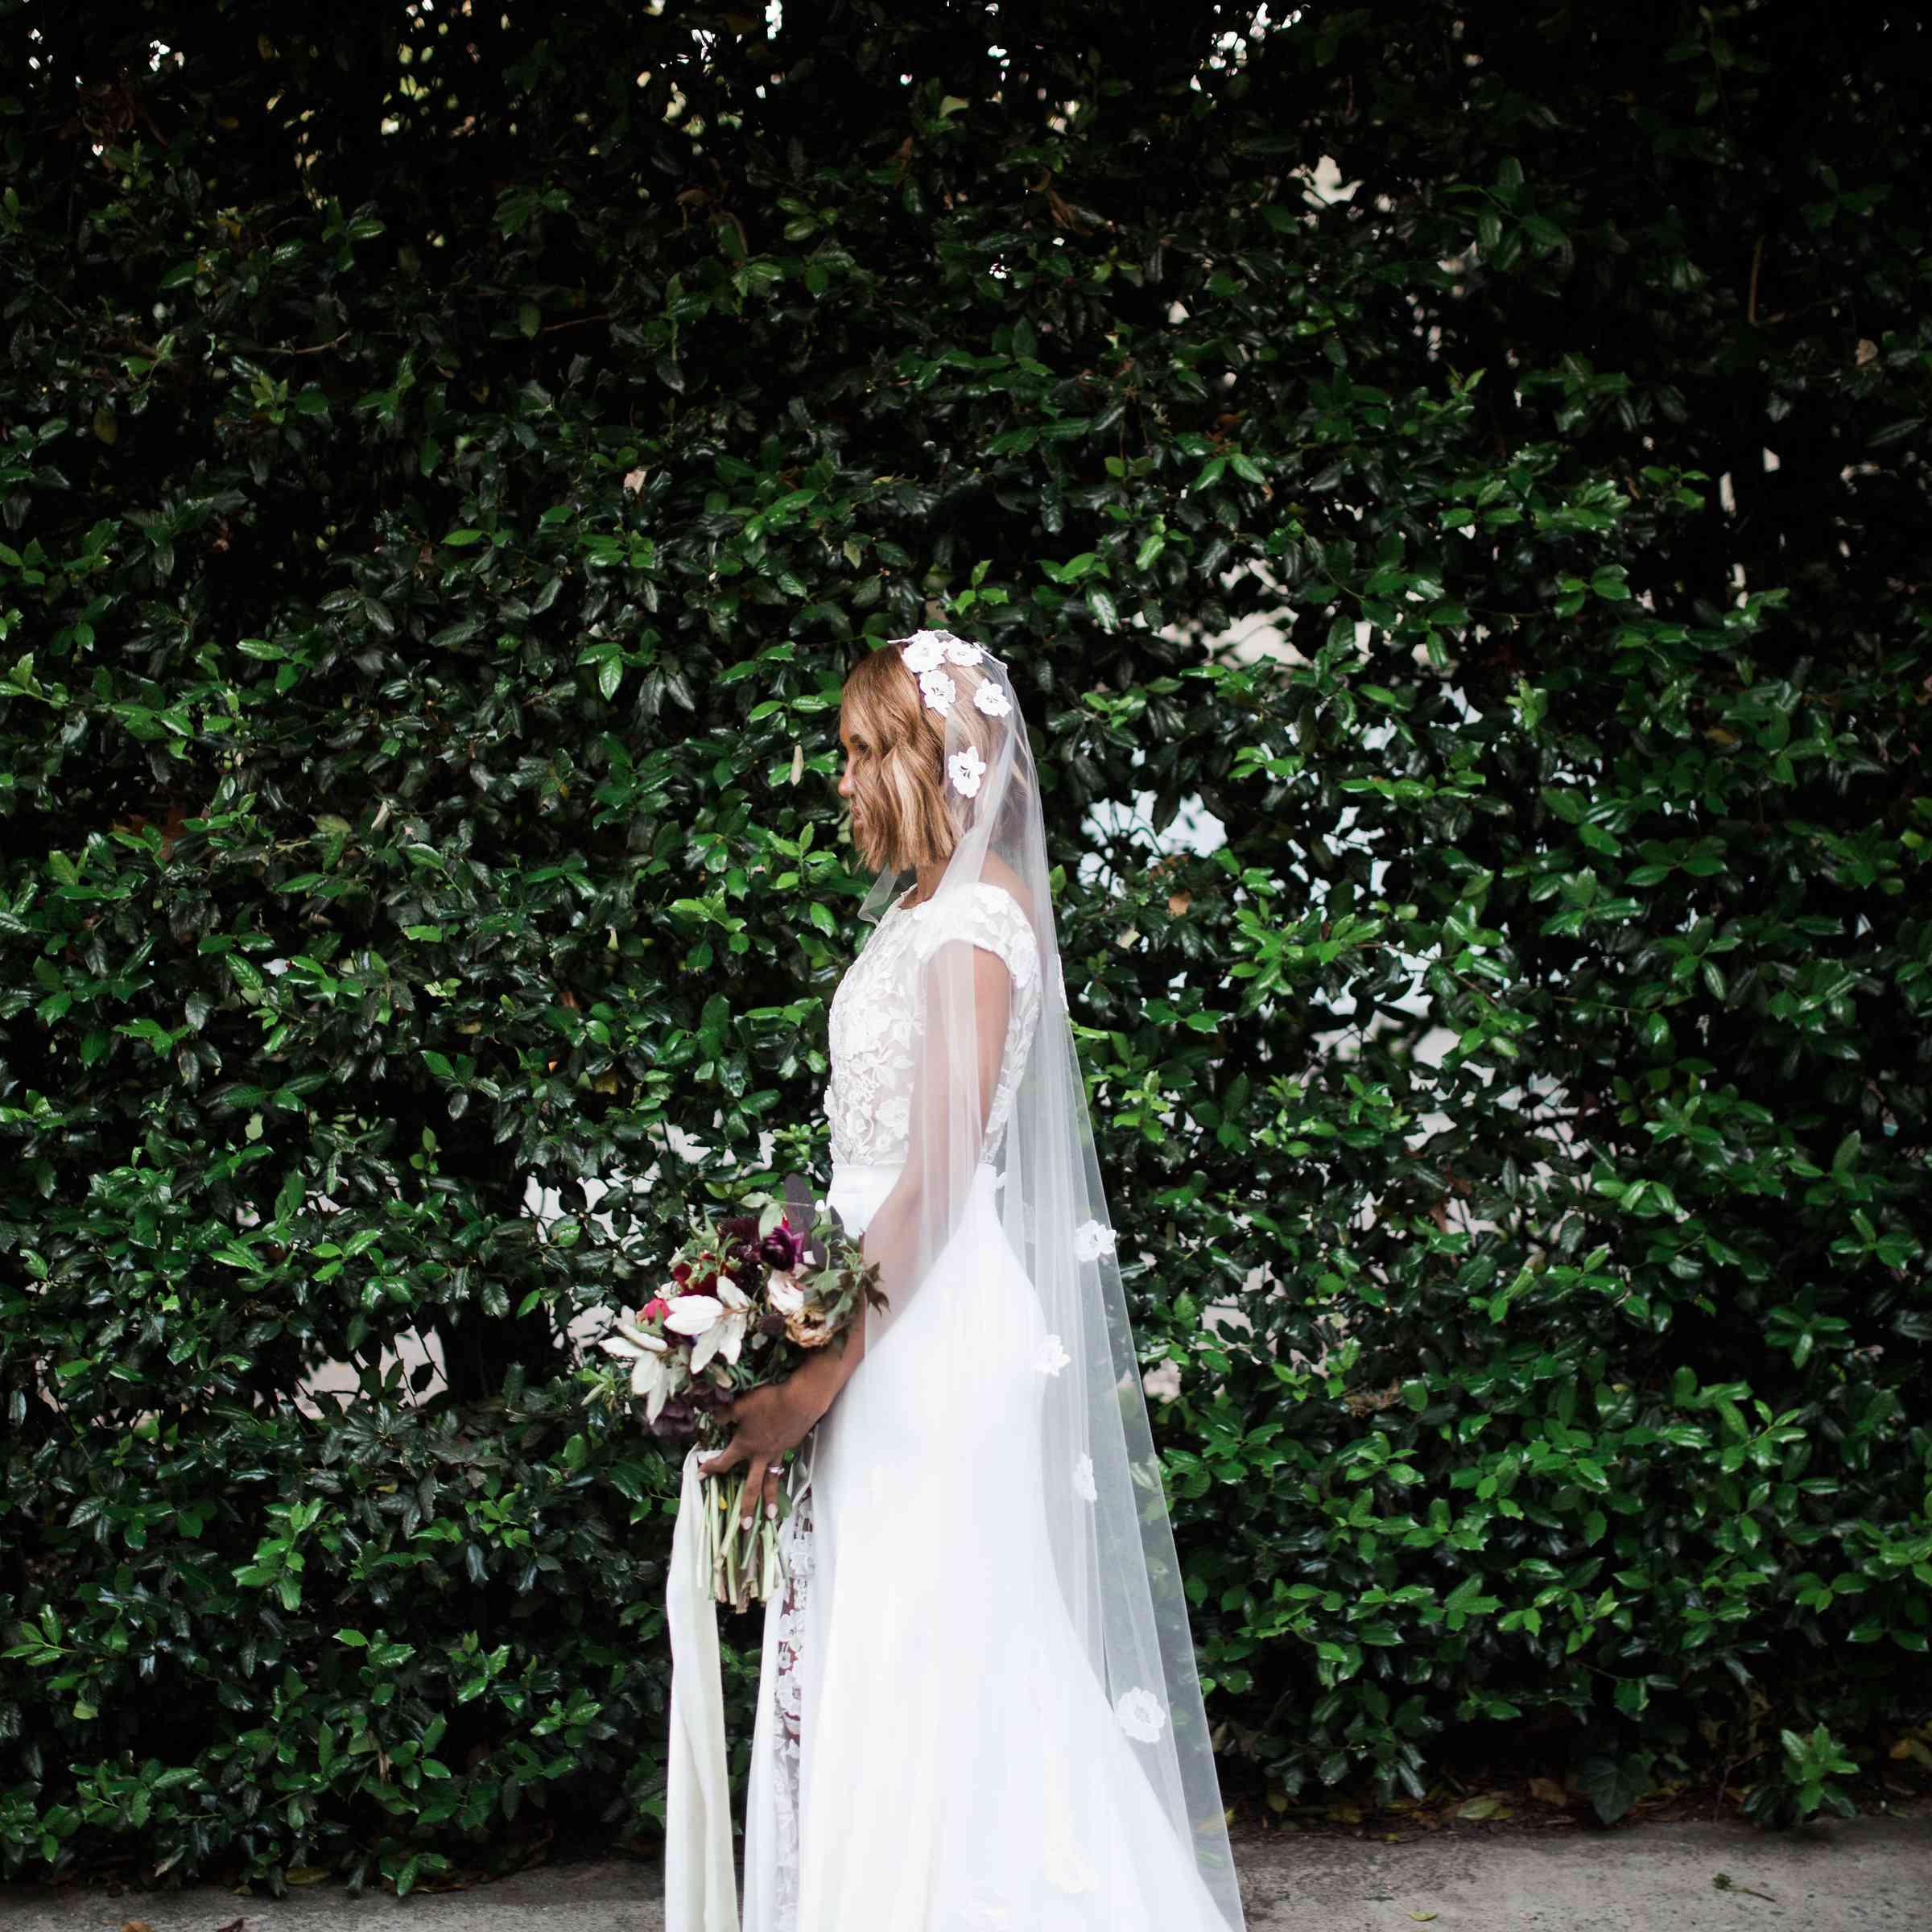 Bride outdoors holding bouquet